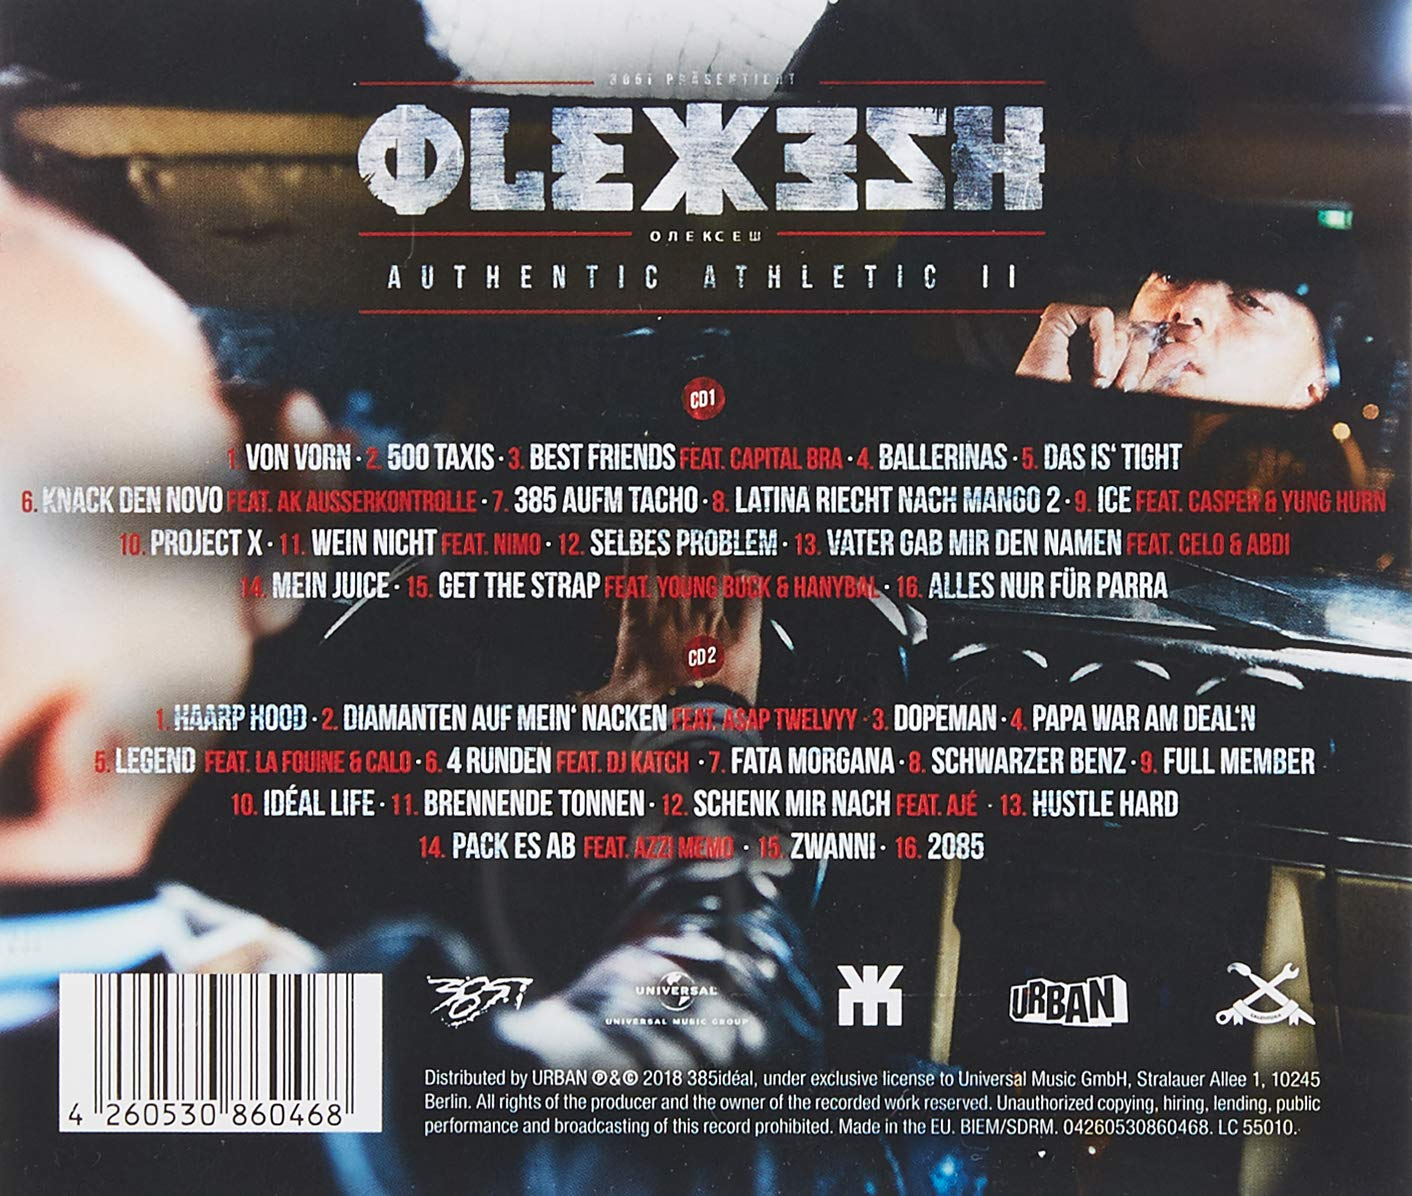 f4746b0ac5b Authentic Athletic 2 (Ltd.Deluxe Box) - Olexesh  Amazon.de  Musik